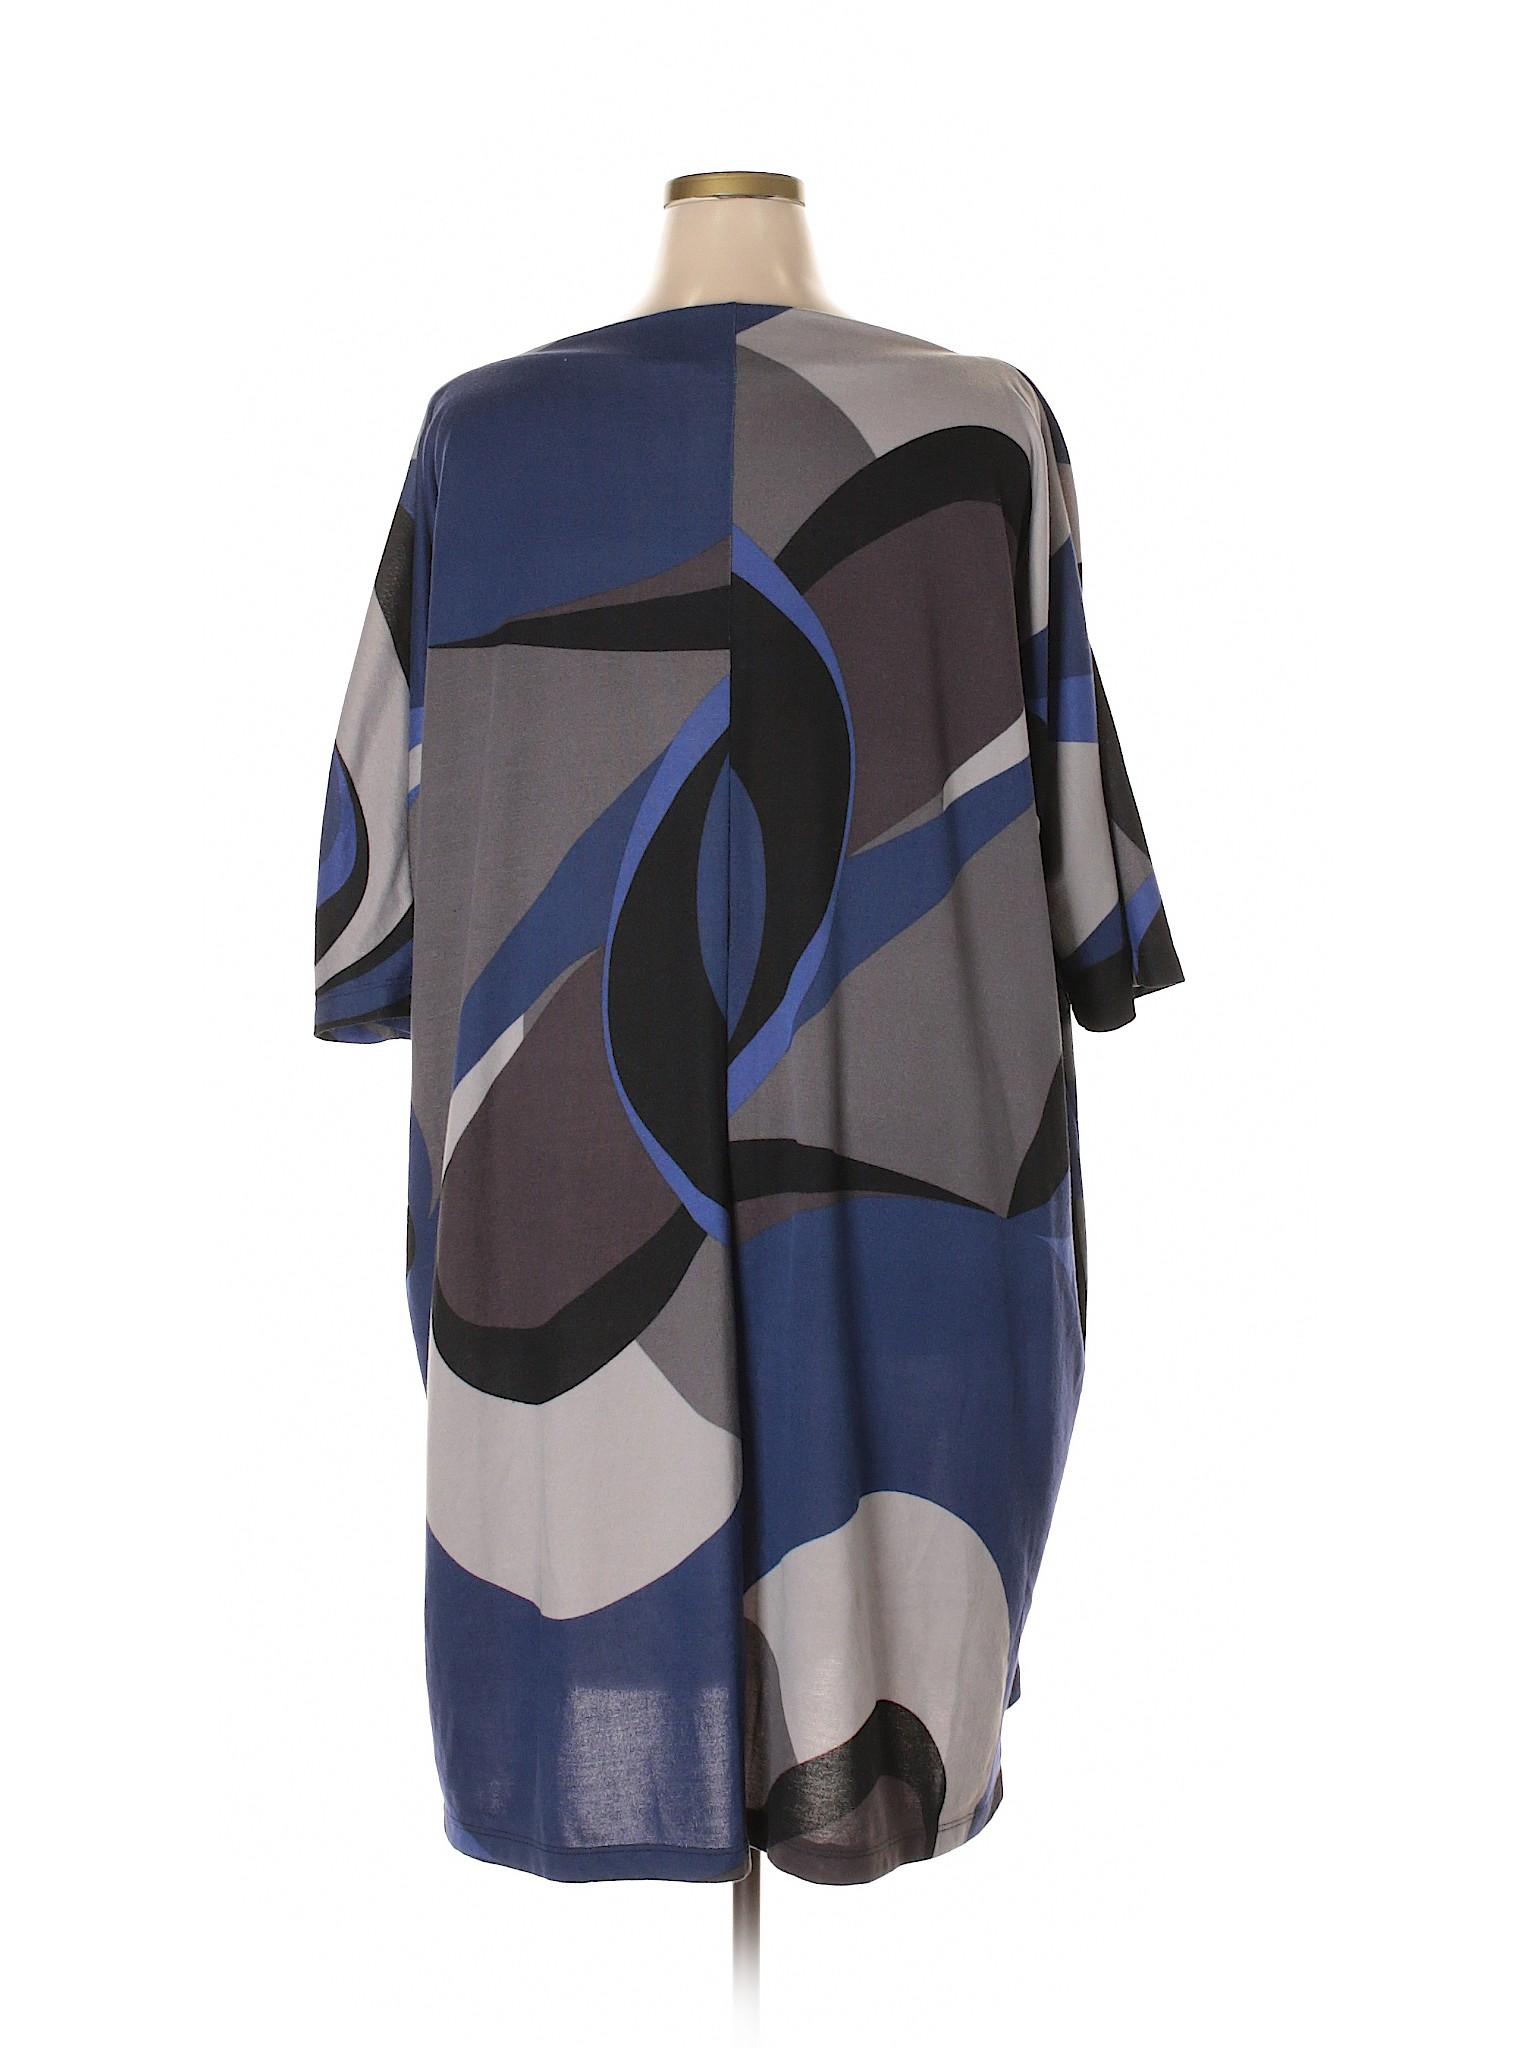 Avenue winter Casual Avenue Dress Boutique Boutique Casual winter qX551w6x